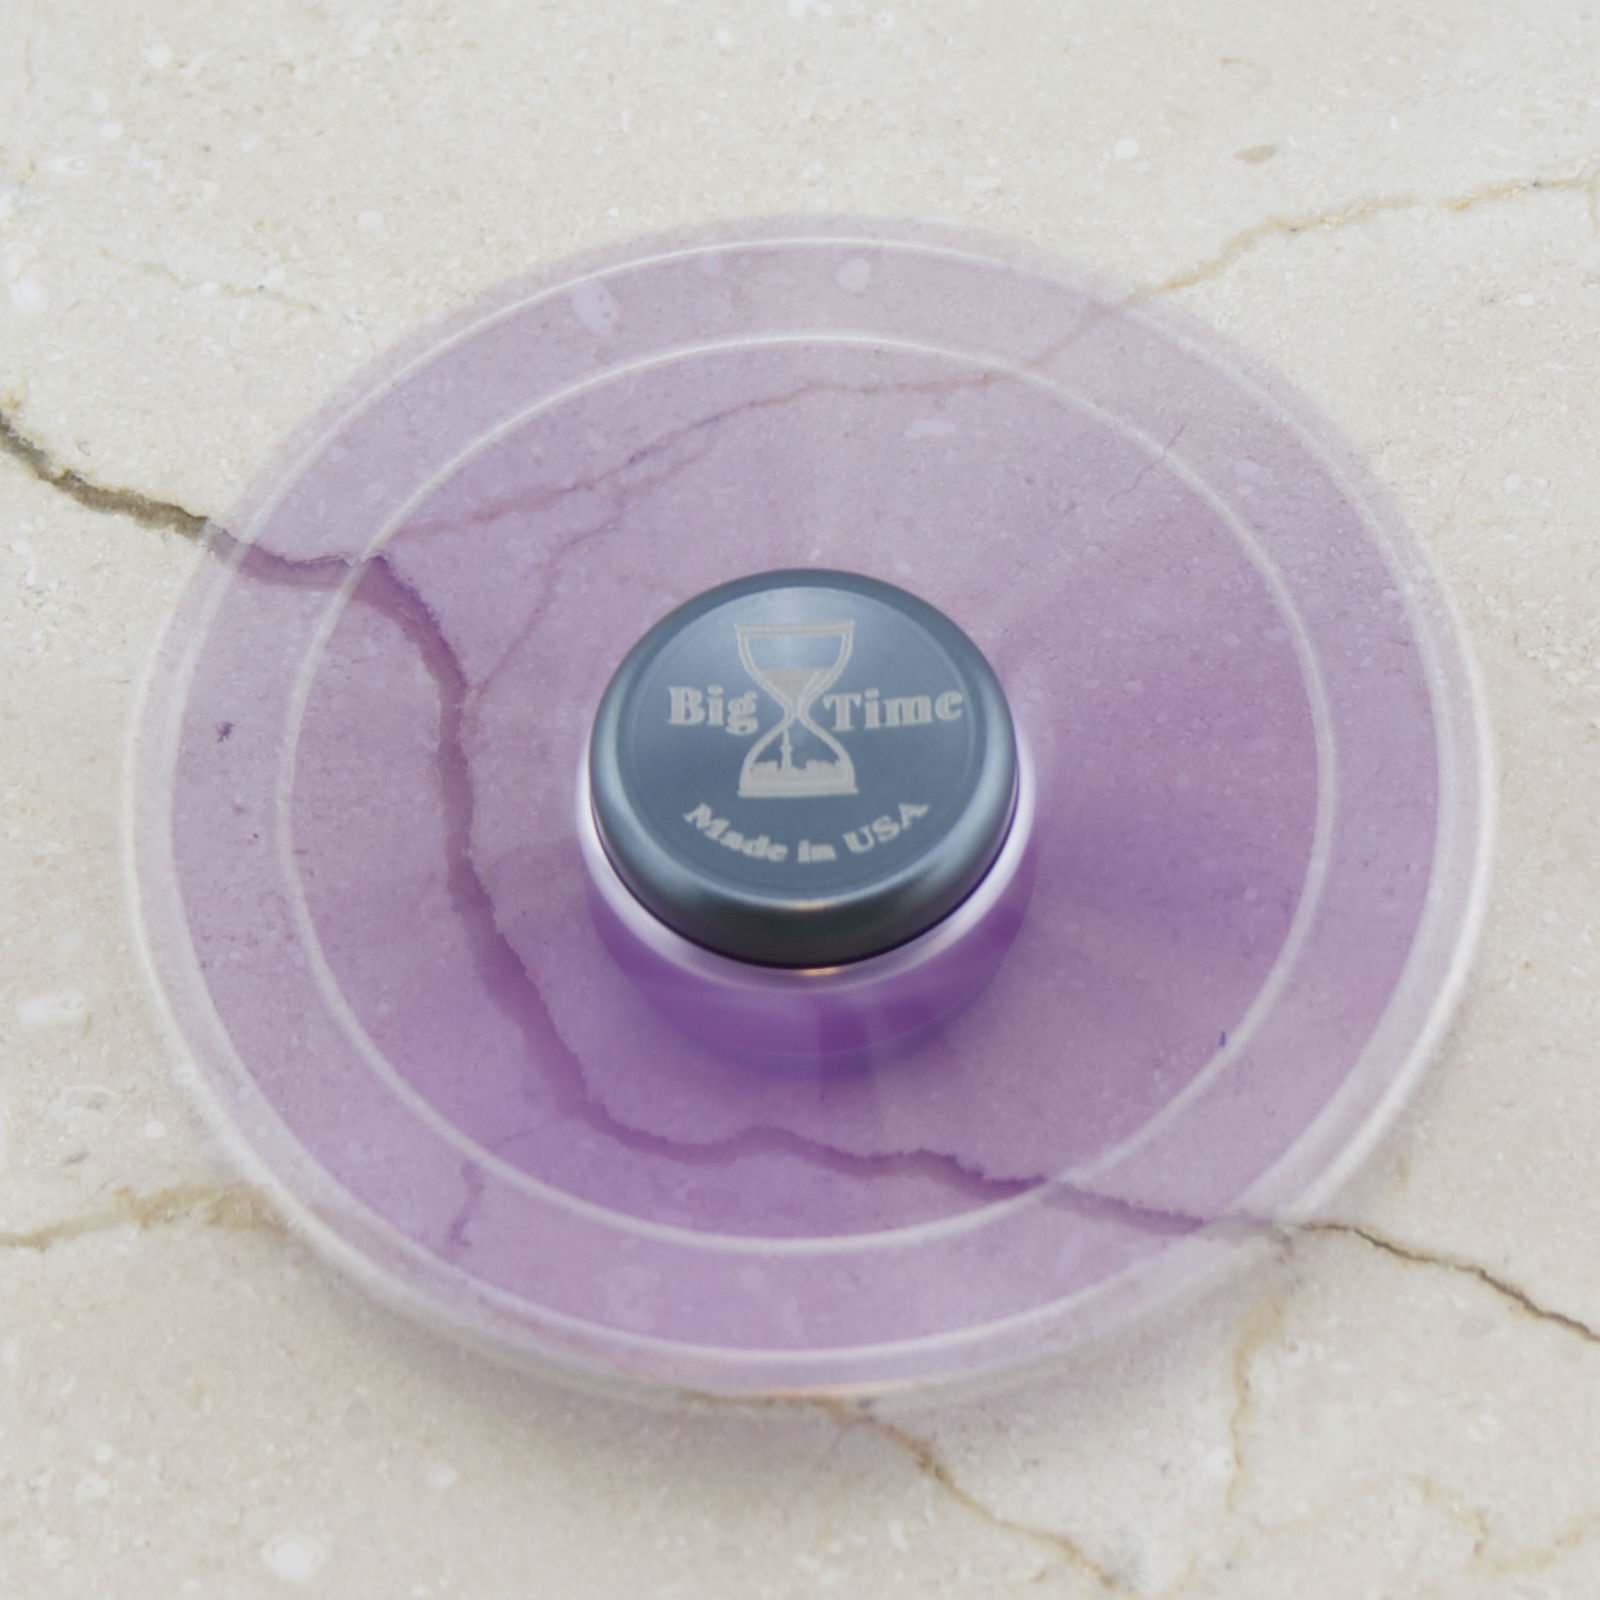 Sp Fidget Spinner Galaxy 3d Purple Pink Spinning Toy Hq Bearing R188 Triangle Keramik Ceramic Toys Mainan Anak Source 16001600